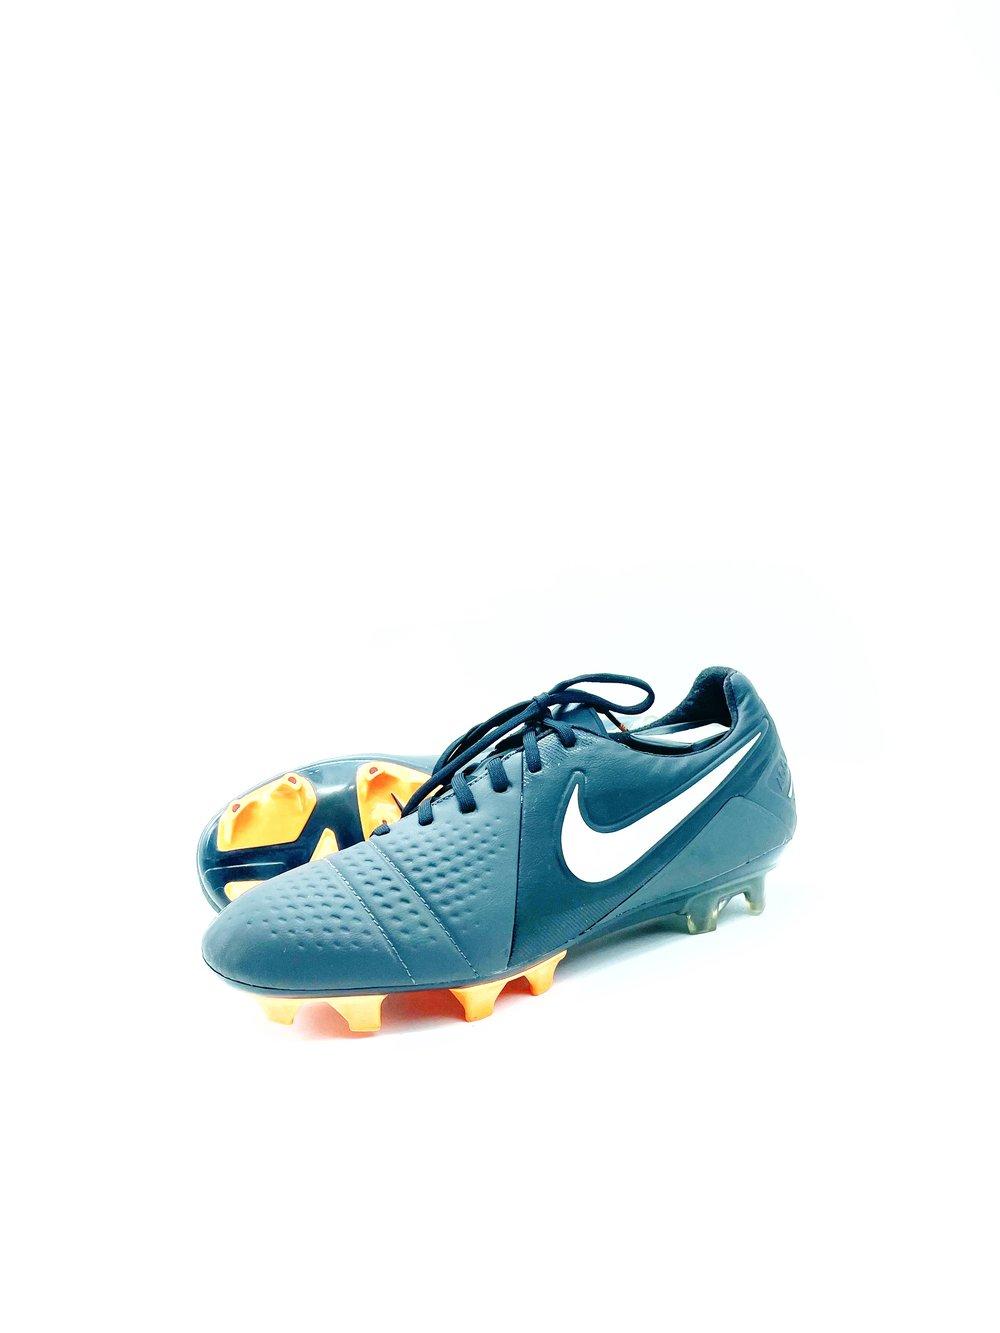 Image of Nike Ctr360 Maestri FG GREY orange